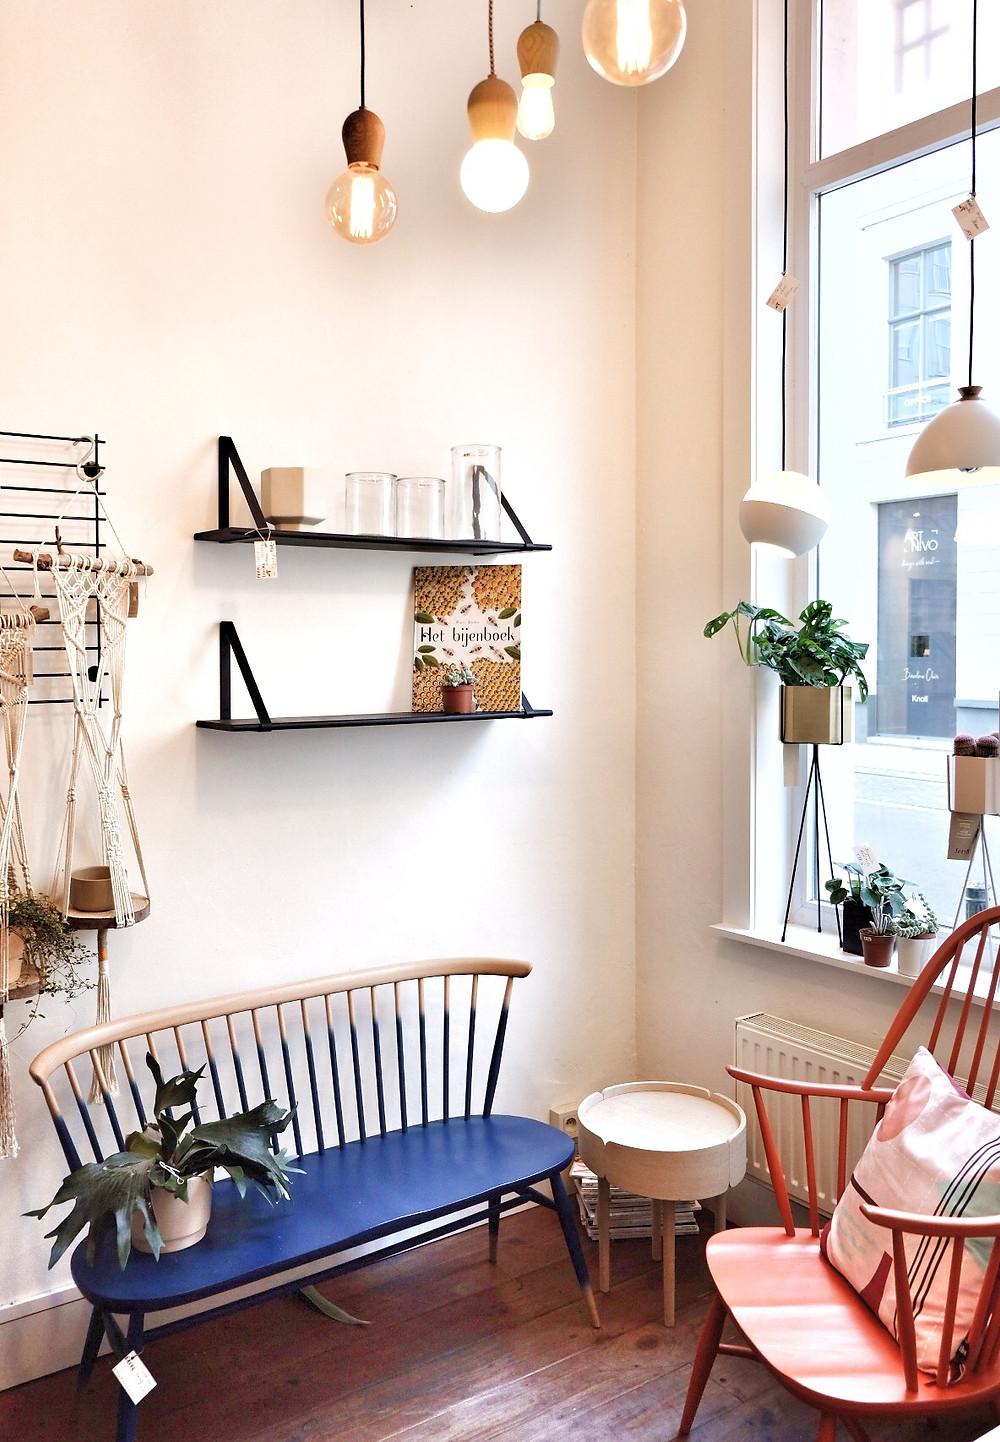 Huiszwaluw interior shop in Ghent